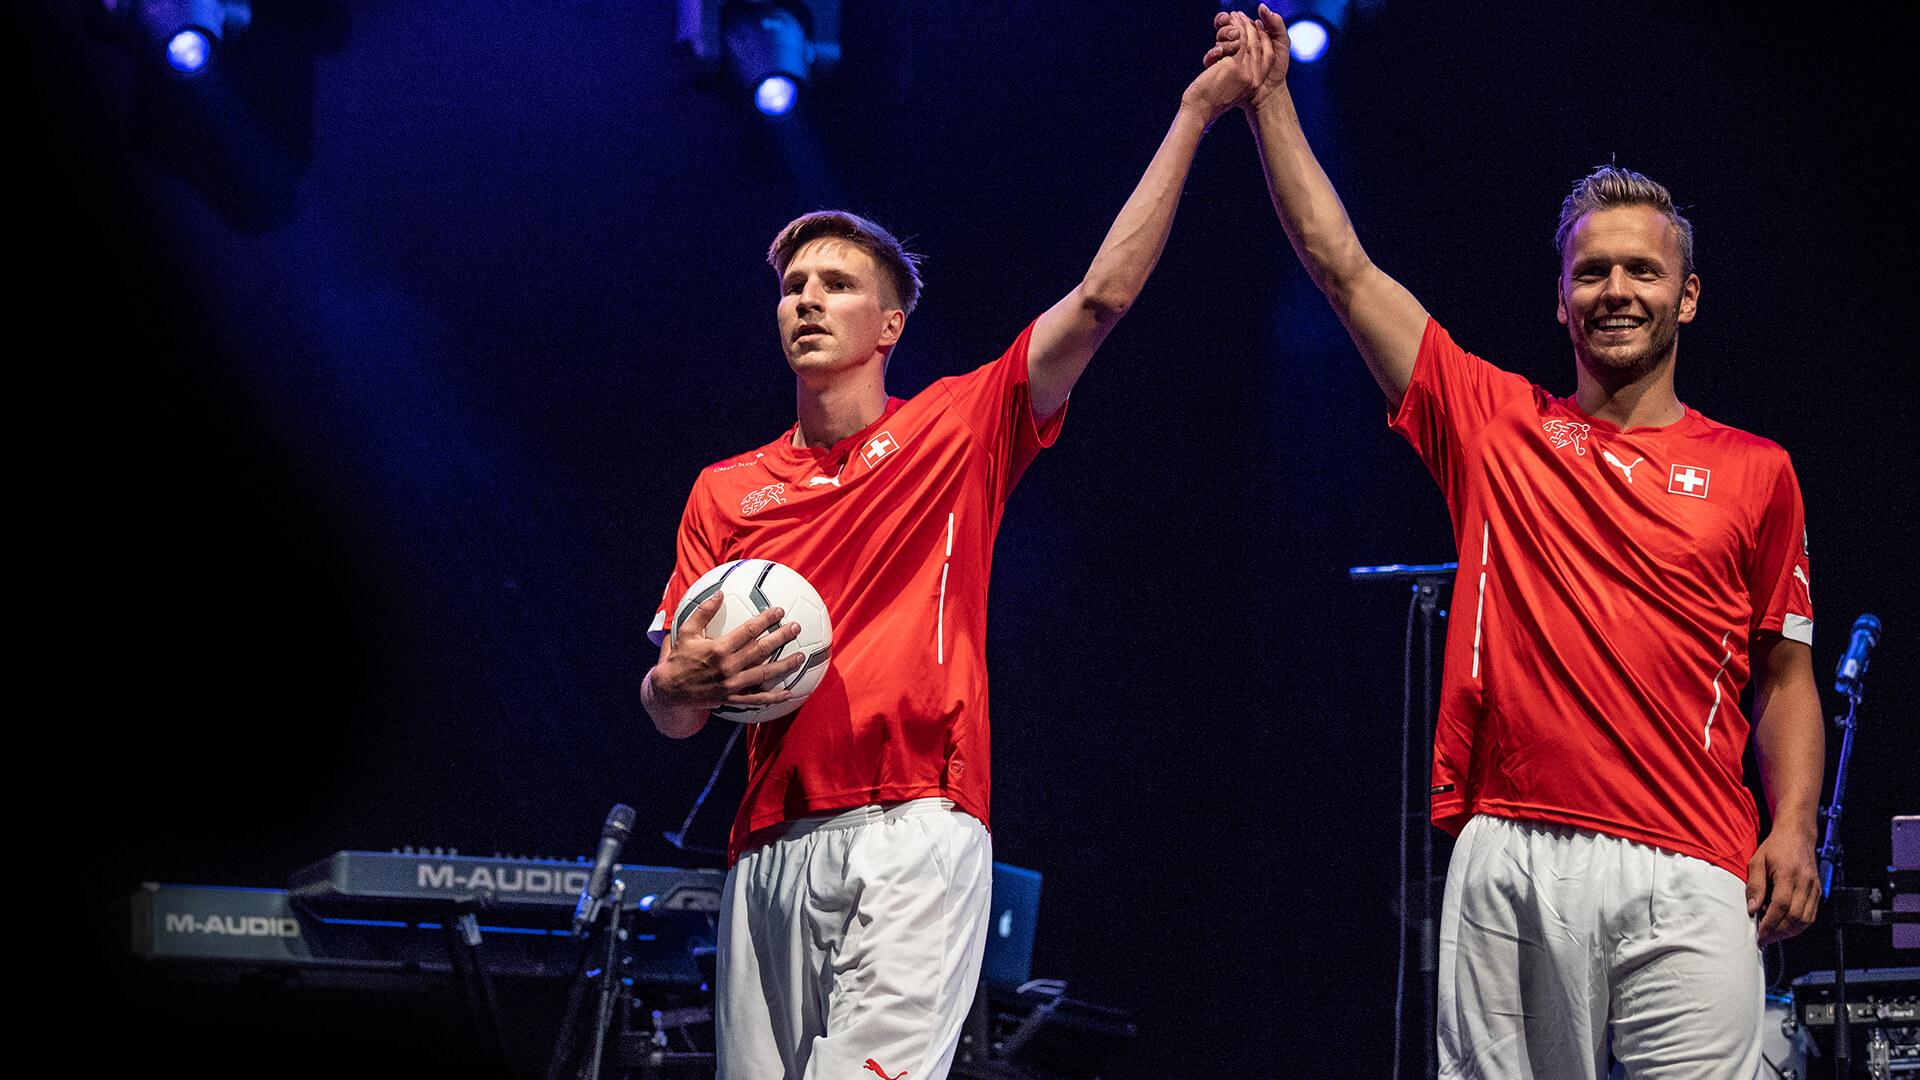 showauftritt-fussball-adrian-dominik